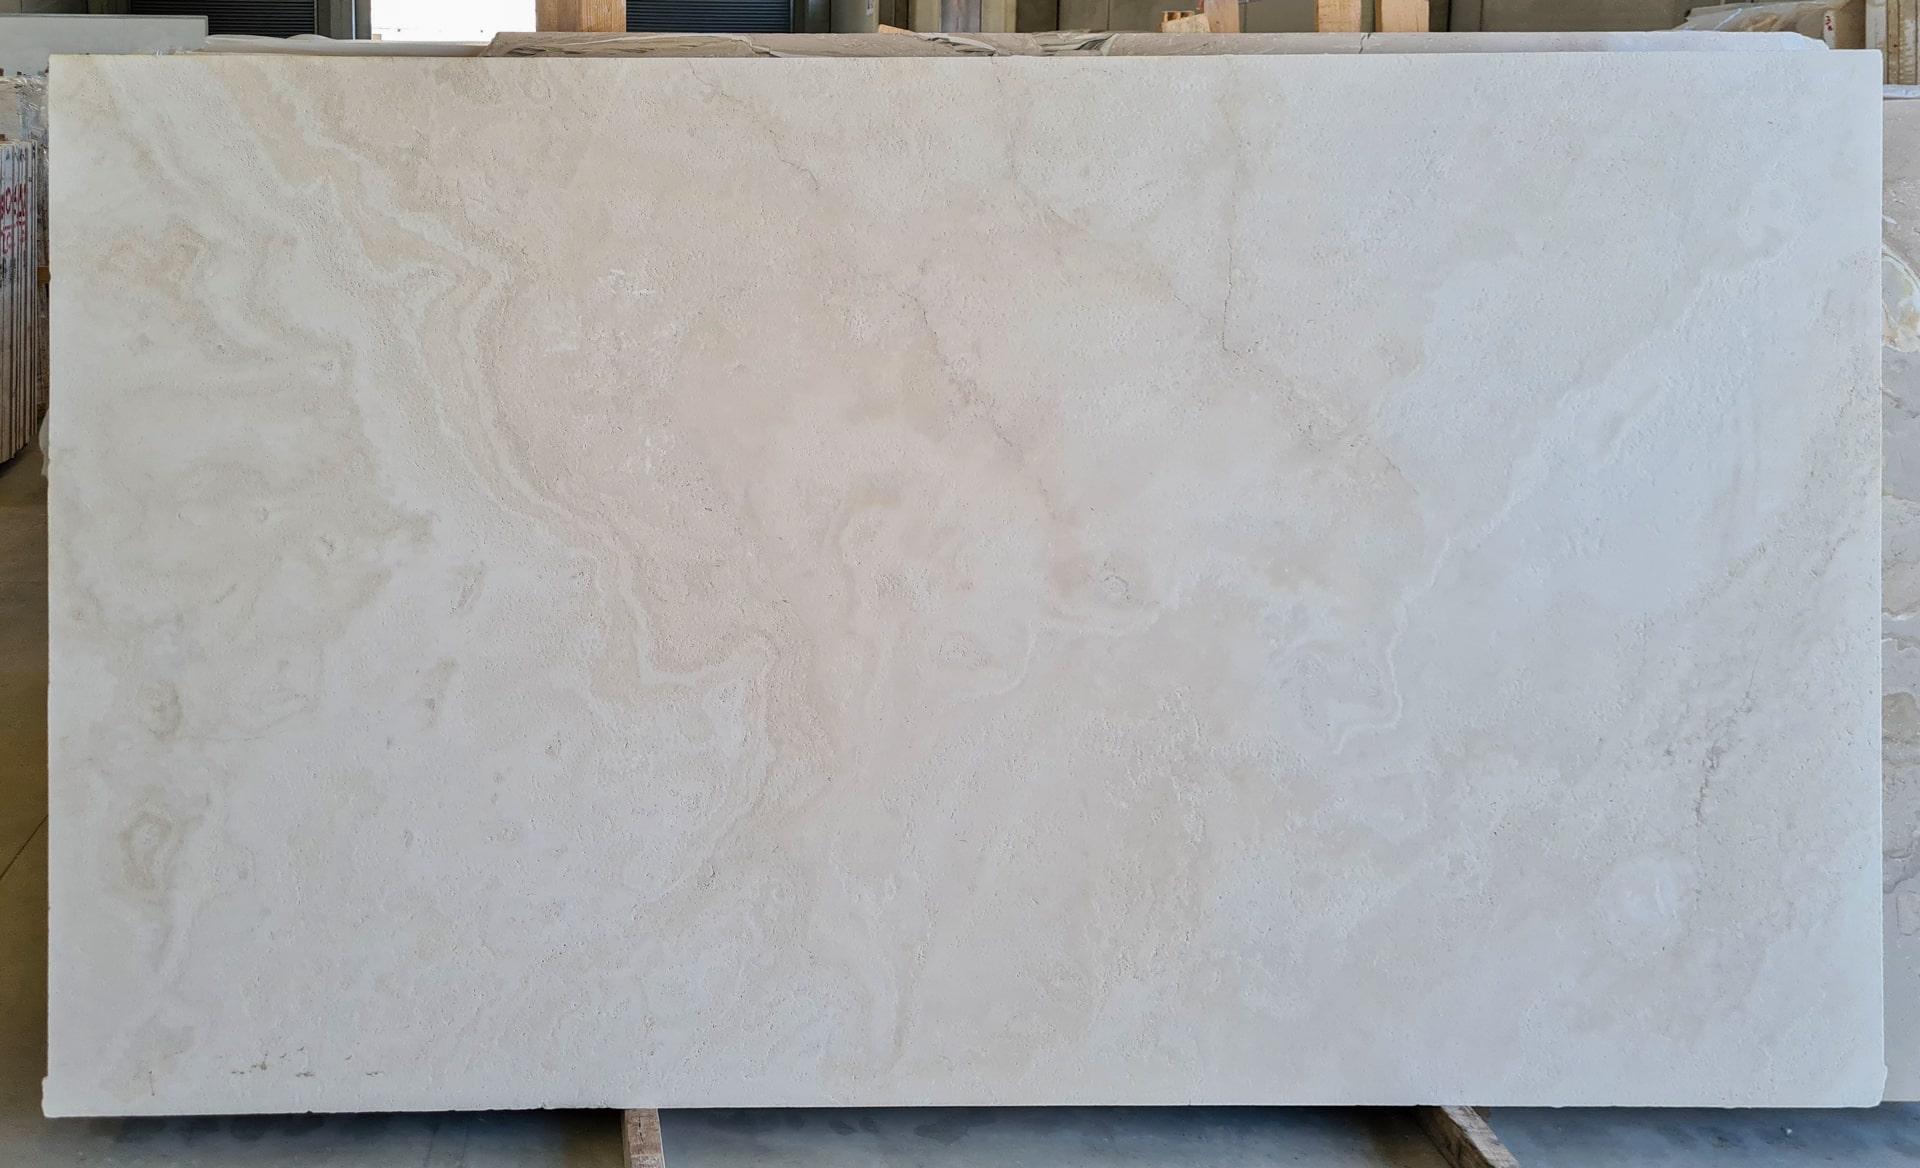 bianco navona 02 travertino evola marmi